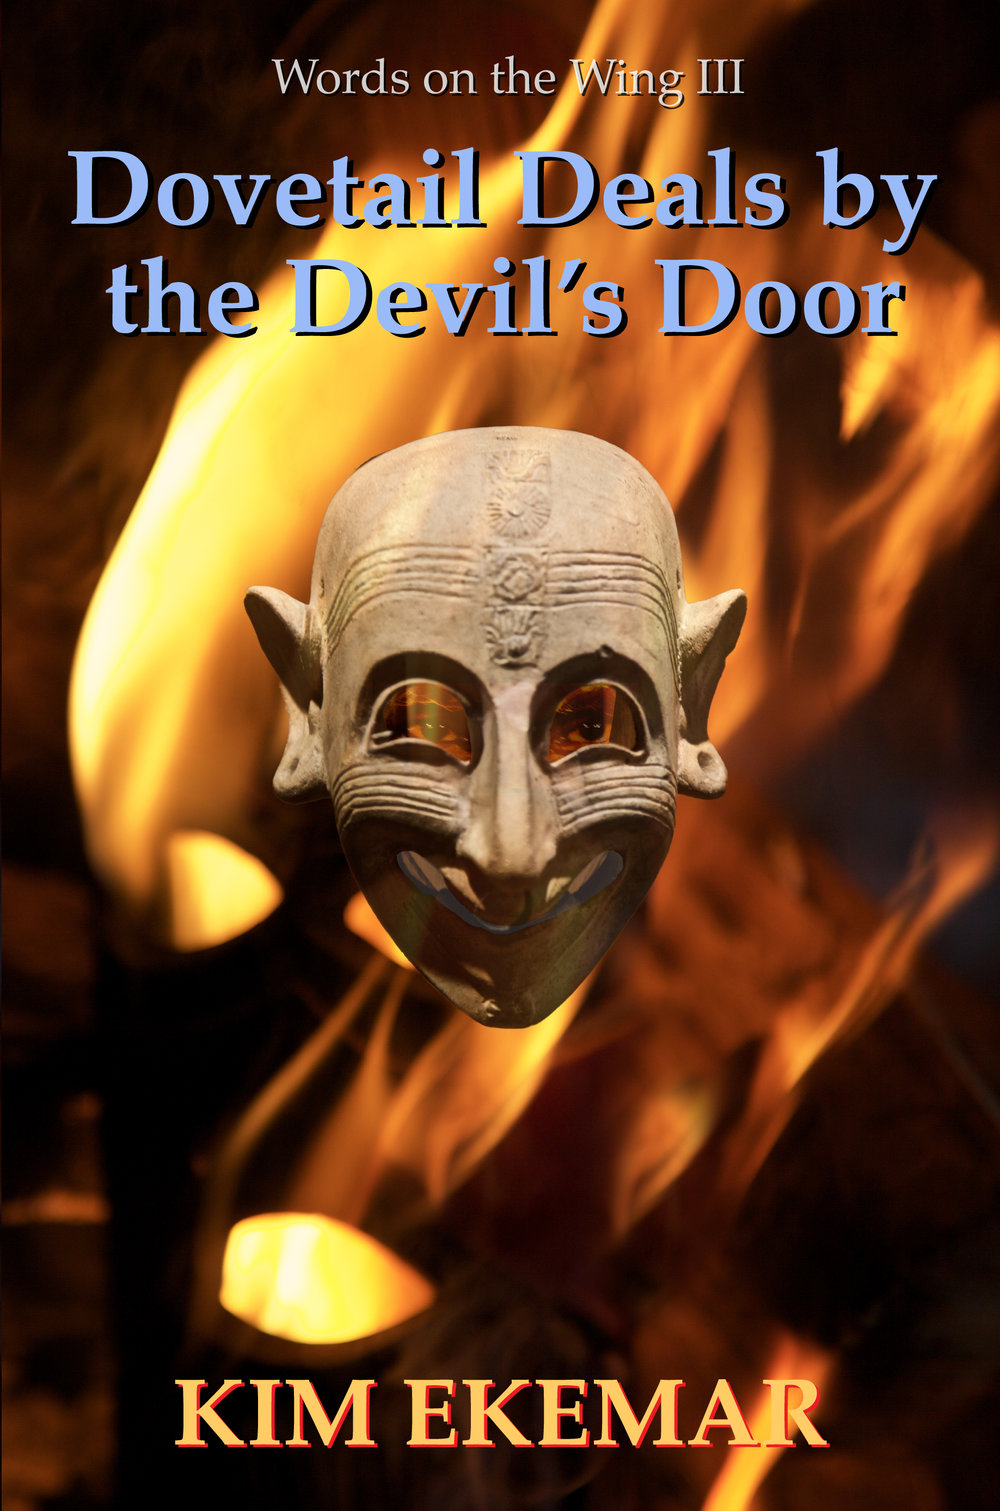 180529 EBOOK Dovetail Deal by the Devil's Door.jpg